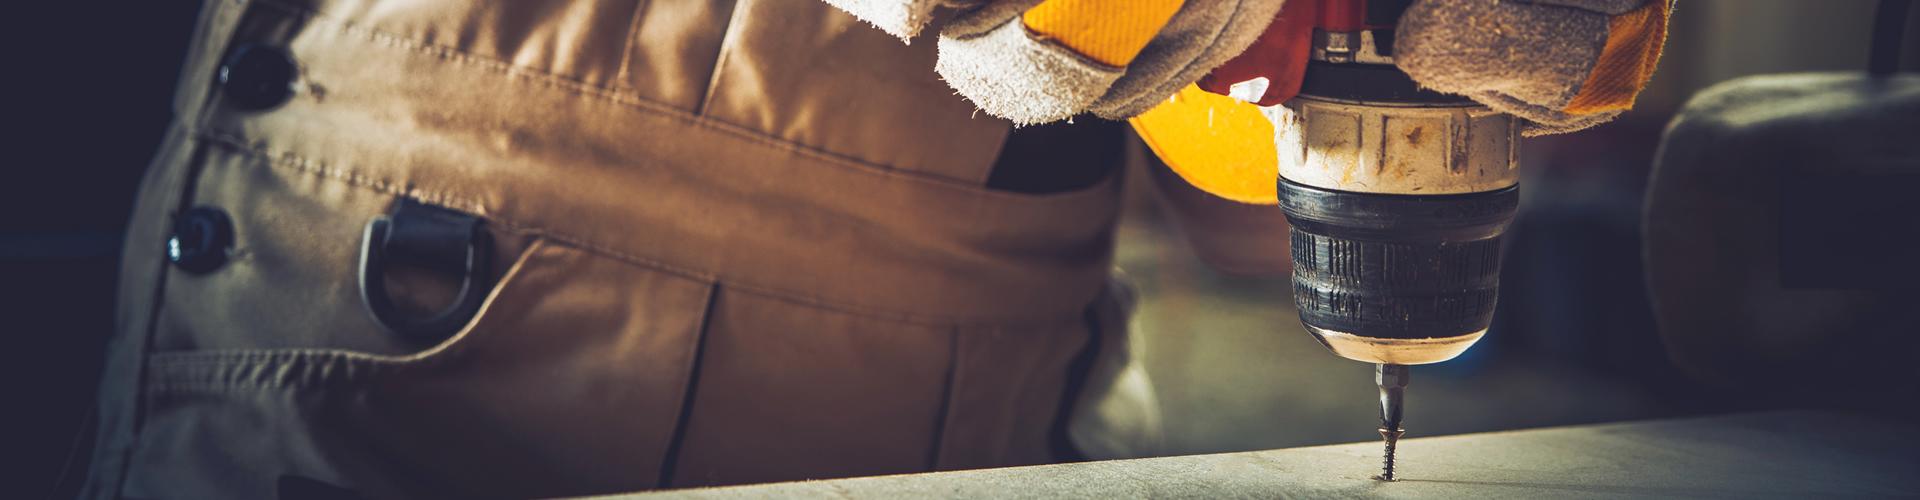 Dikili Tip Rack Kabin | Tekniksat Metal | CNC PUNCH | CNC ABKANT | FİBER LAZER KESİM